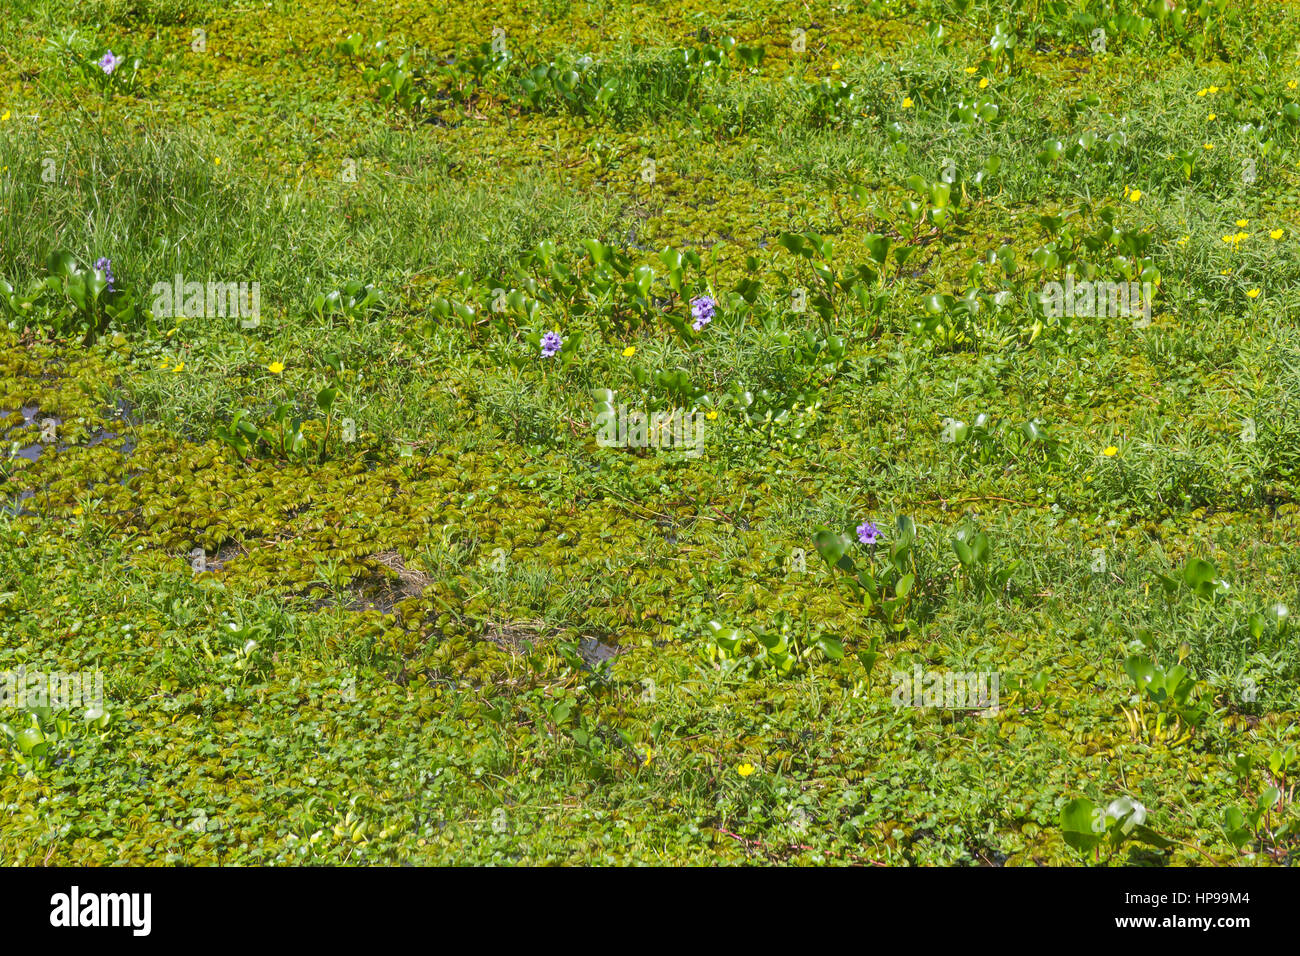 Swamp in Lagoa do Peixe lake, Mostardas city, Rio  Grande do Sul, Brazil. Stock Photo